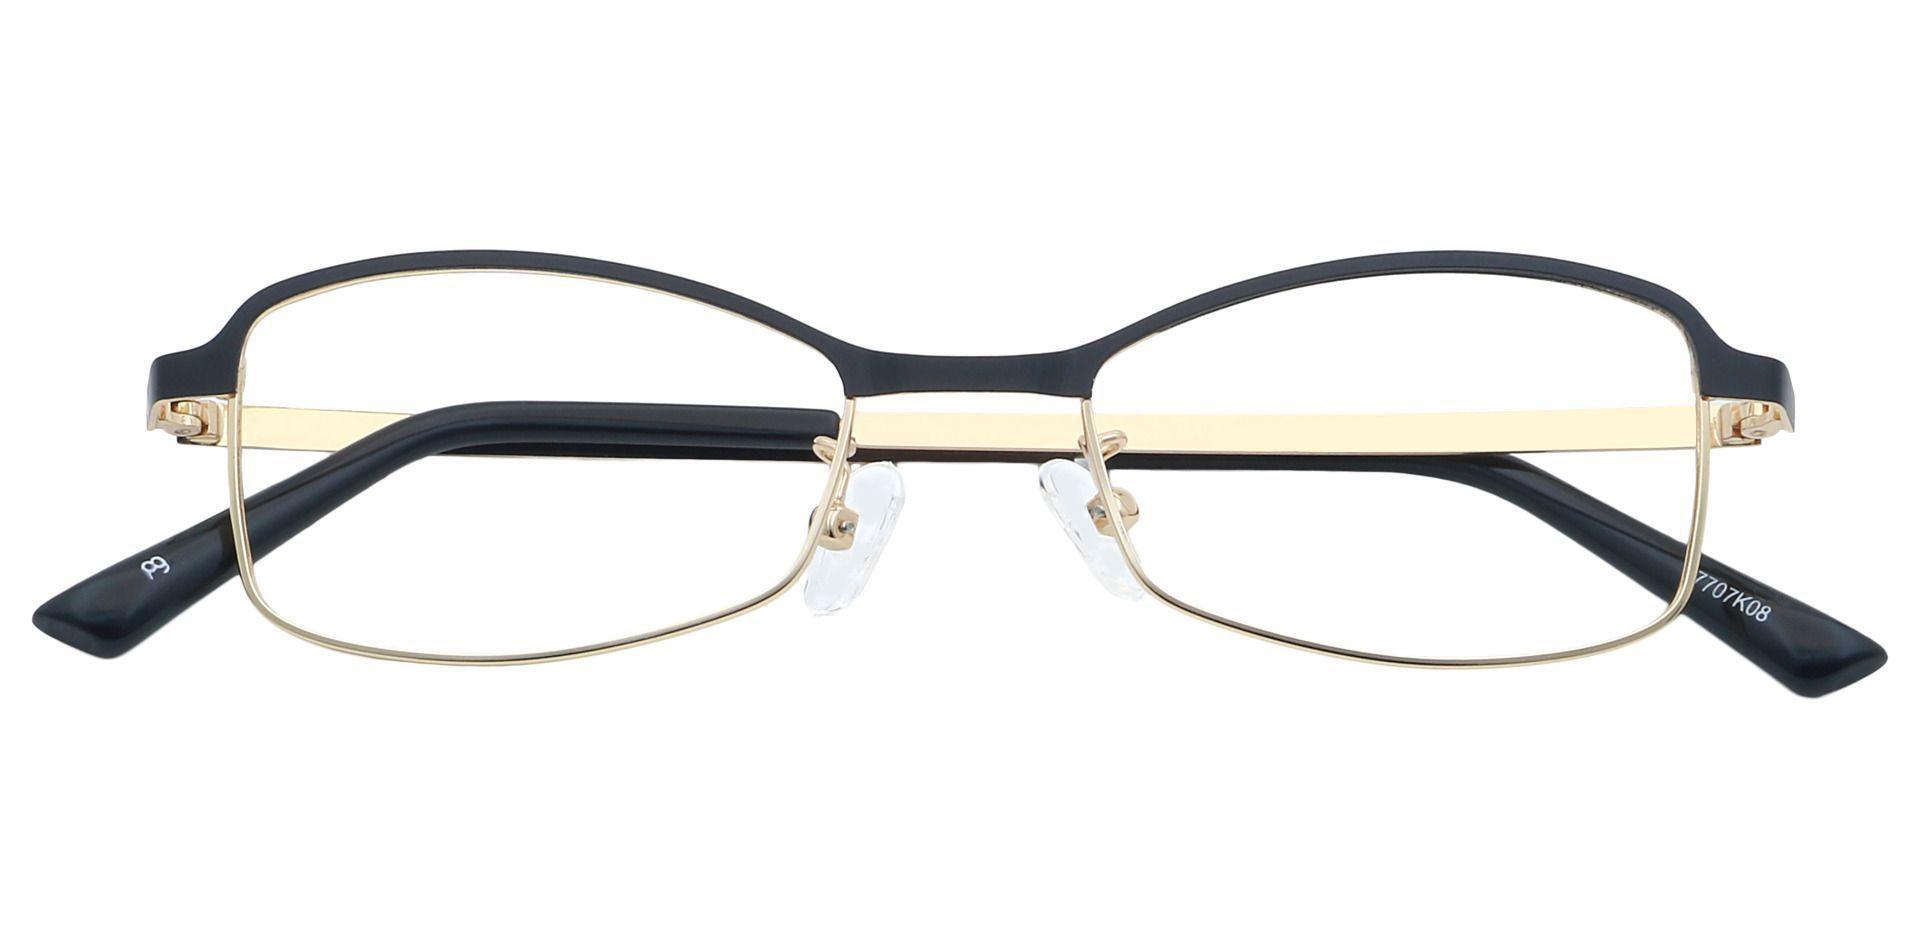 Shelby Rectangle Single Vision Glasses - Black